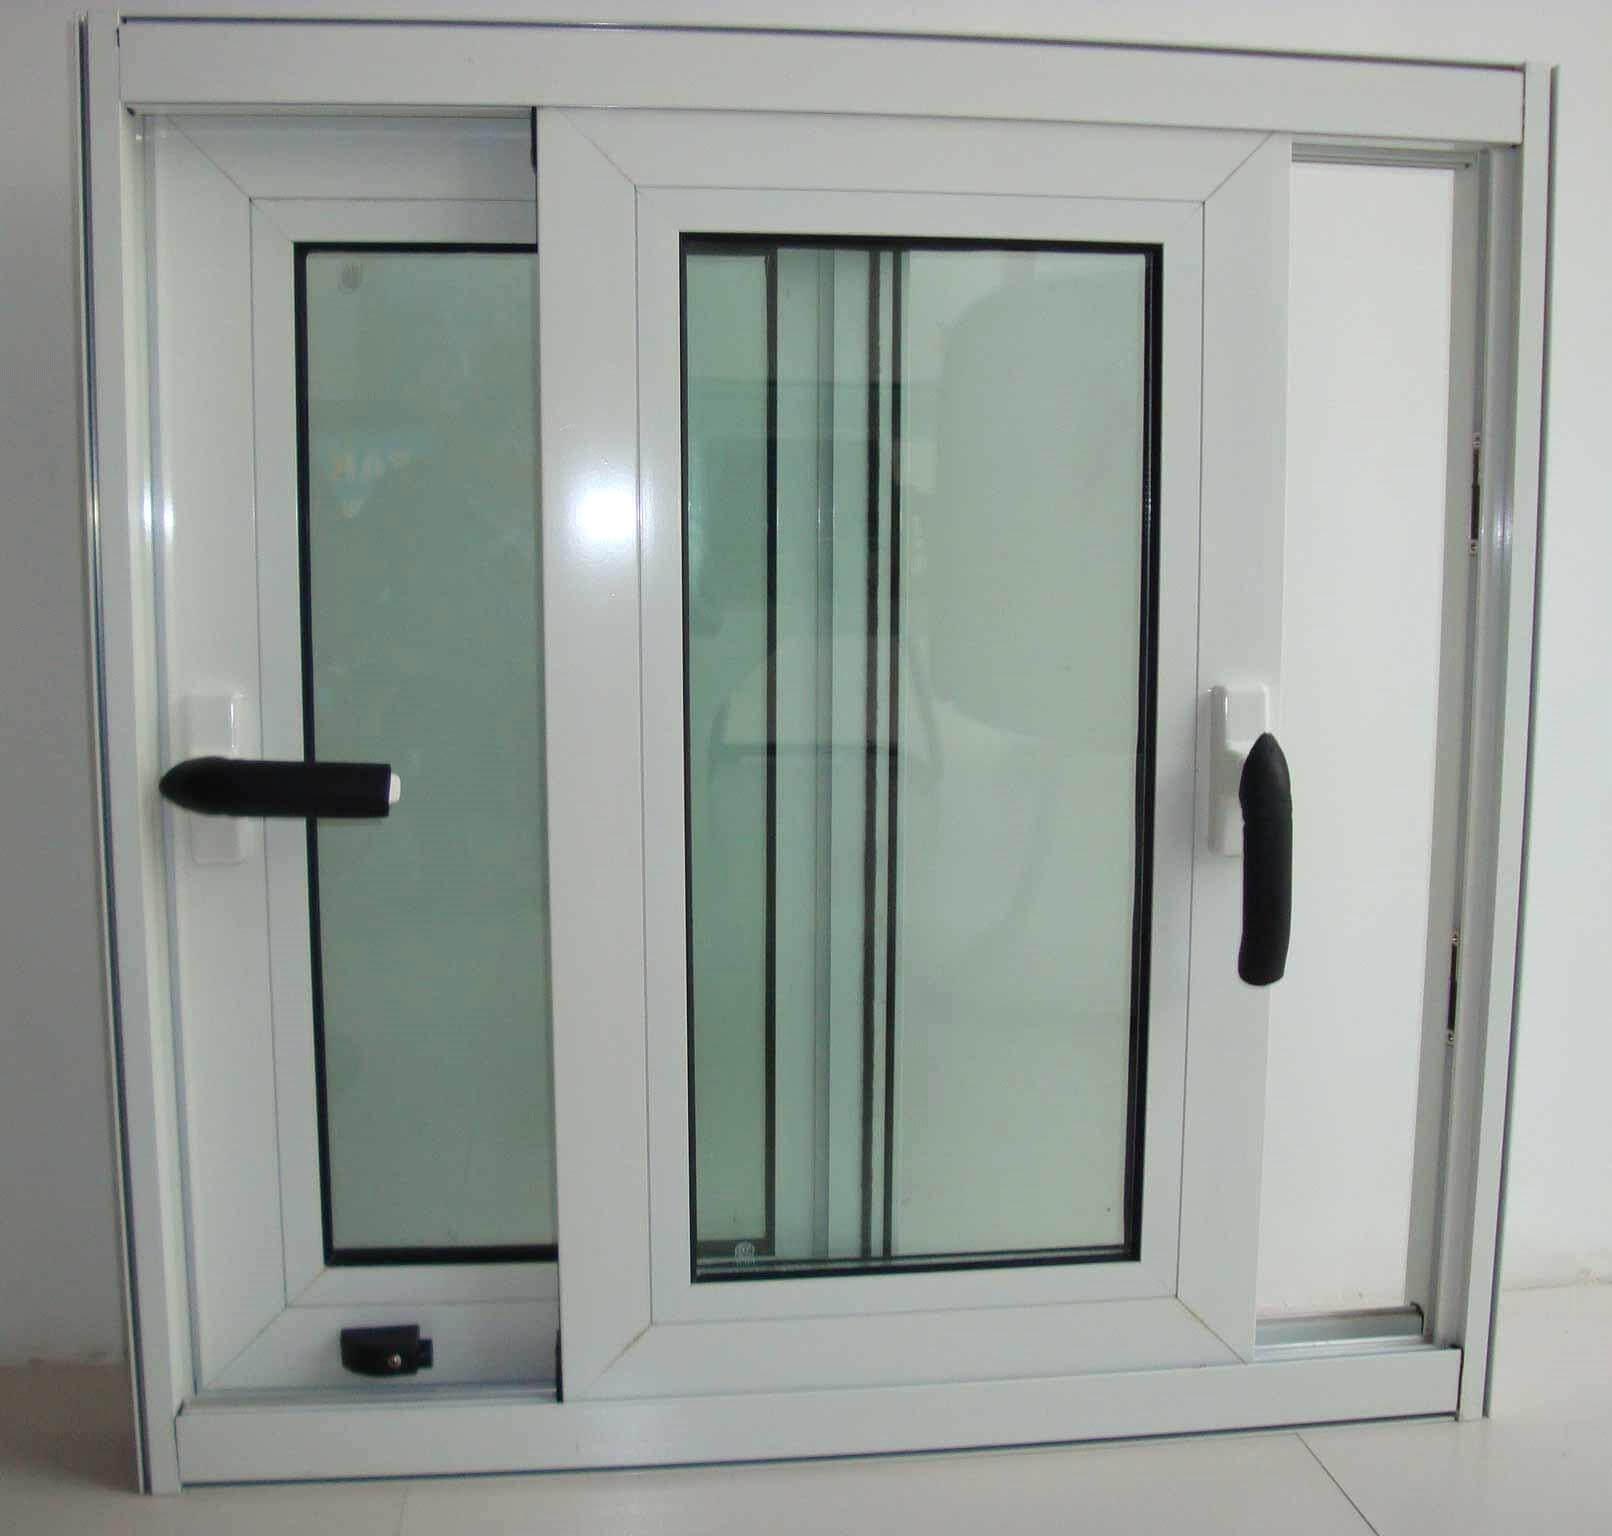 isolation fenetre good fentre alu alf isolation renforce with isolation fenetre voile isolant. Black Bedroom Furniture Sets. Home Design Ideas